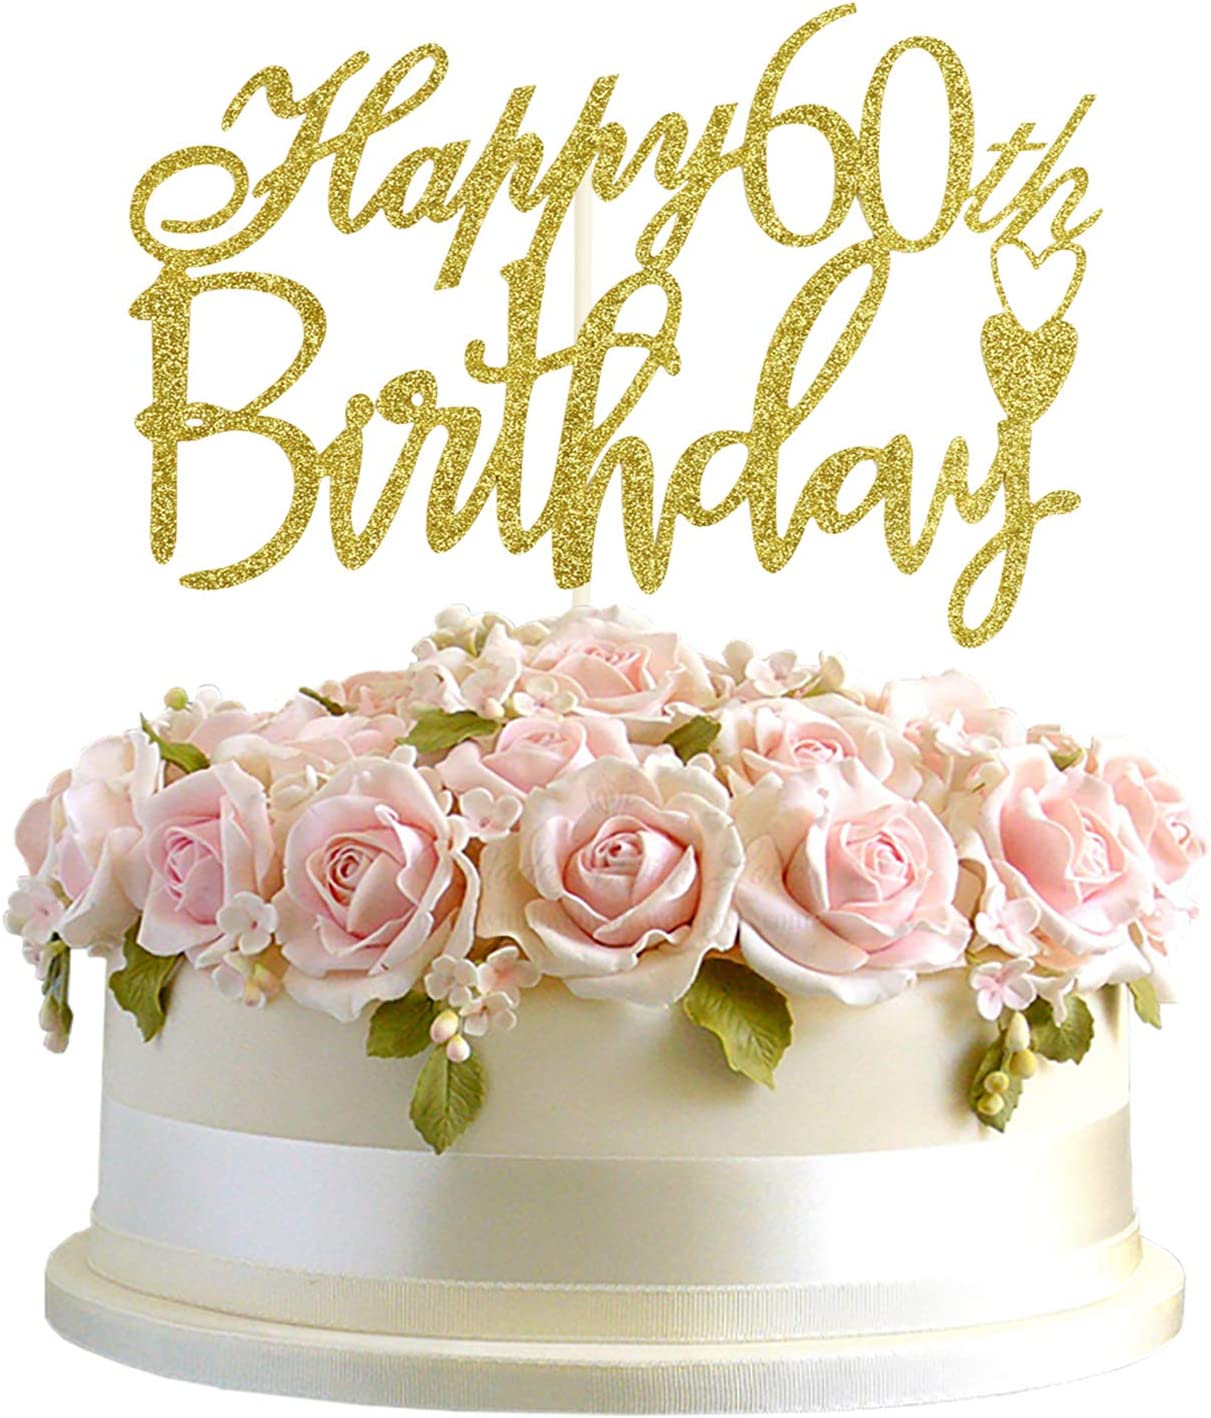 Fabulous Amazon Com Junucubo 60Th Birthday Cake Topper Gold Glitter Cheers Funny Birthday Cards Online Inifodamsfinfo